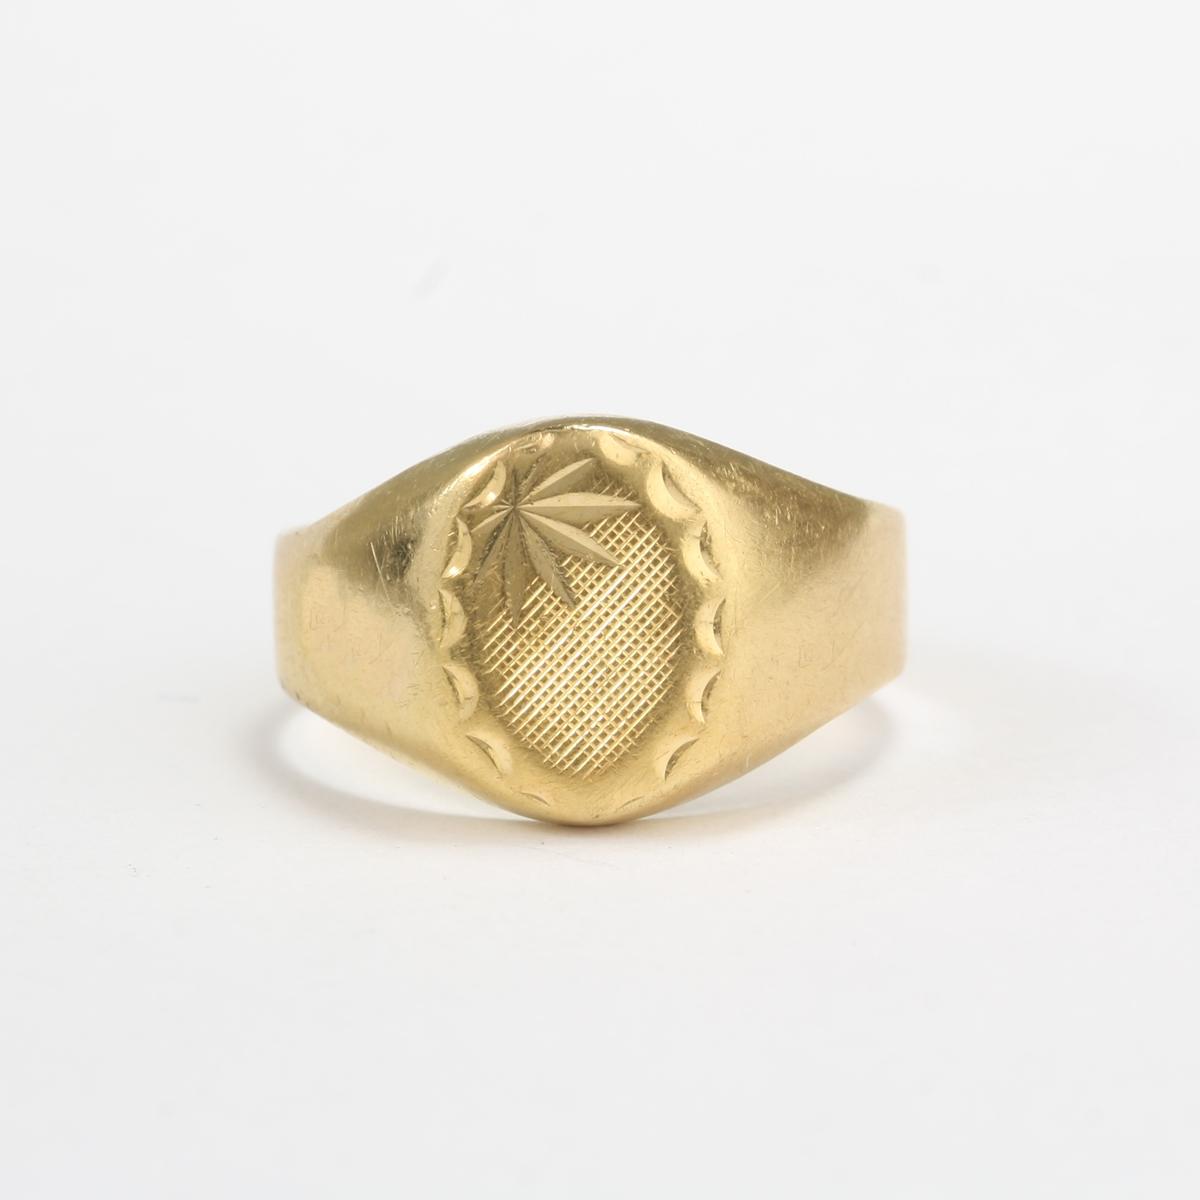 pre owned 14 karat yellow gold child signet ring